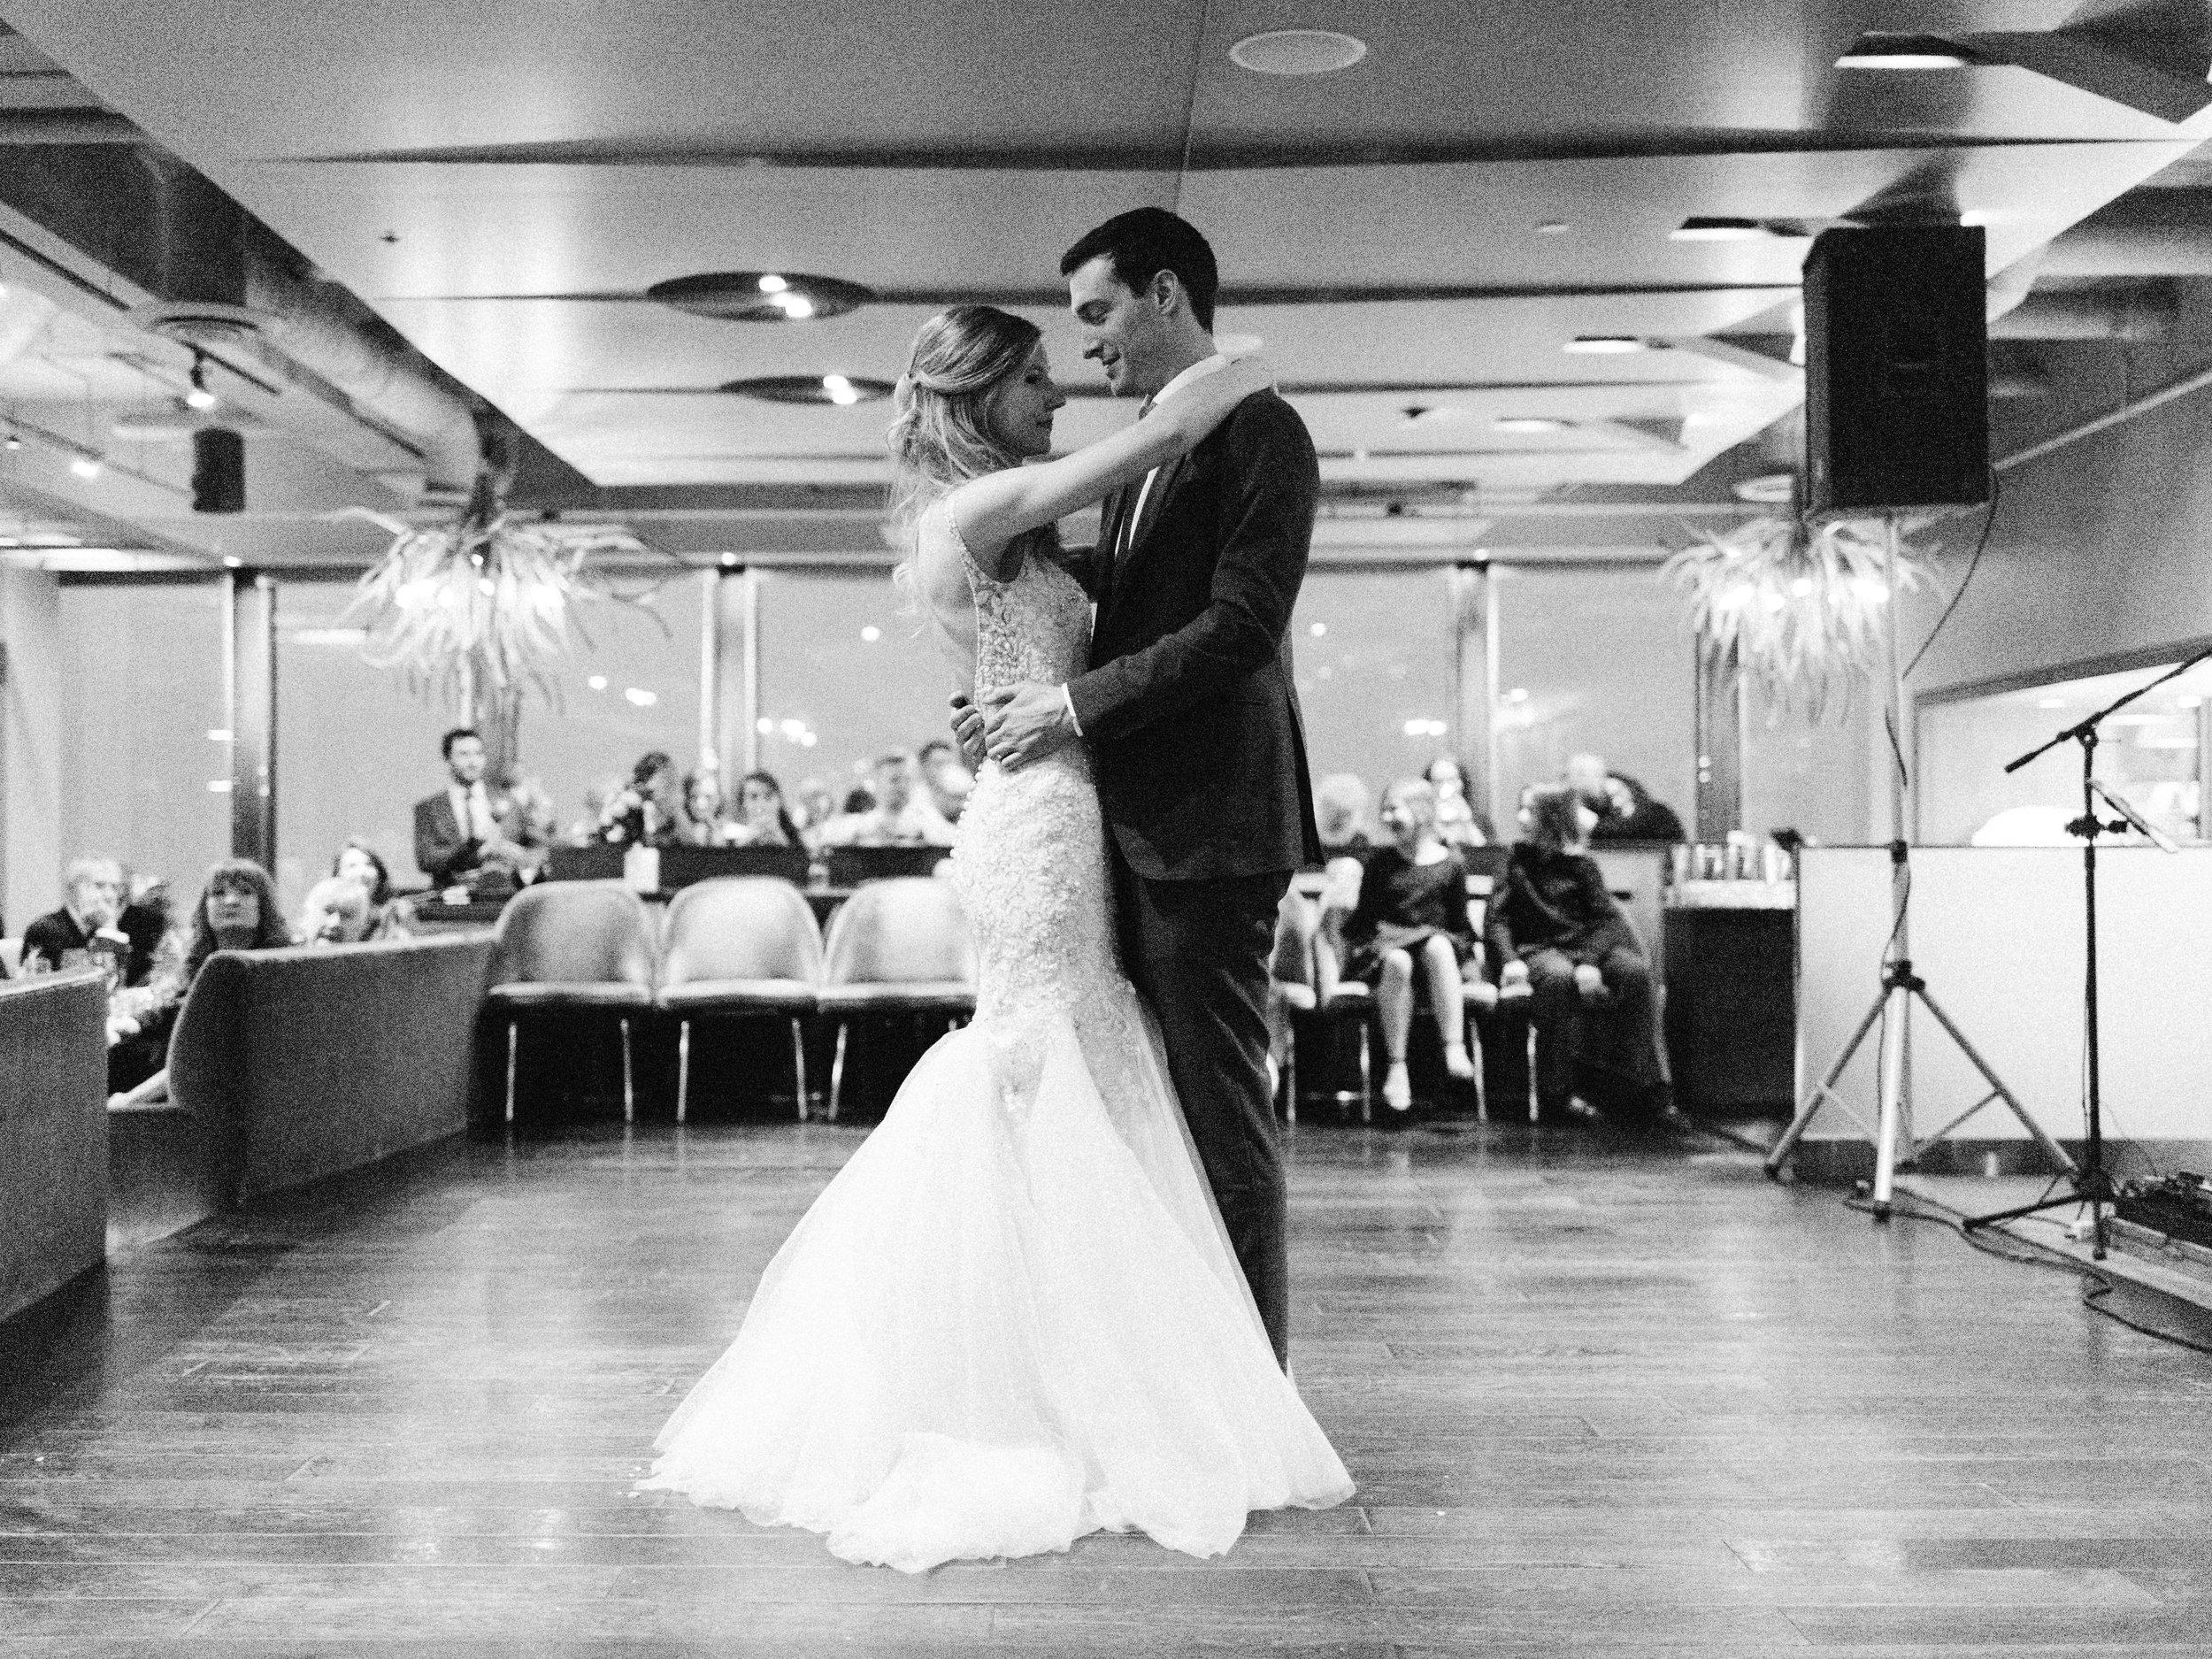 Toronto-wedding-photographer-downtown-winter-wedding-intimate-restaurant-canoe183.jpg